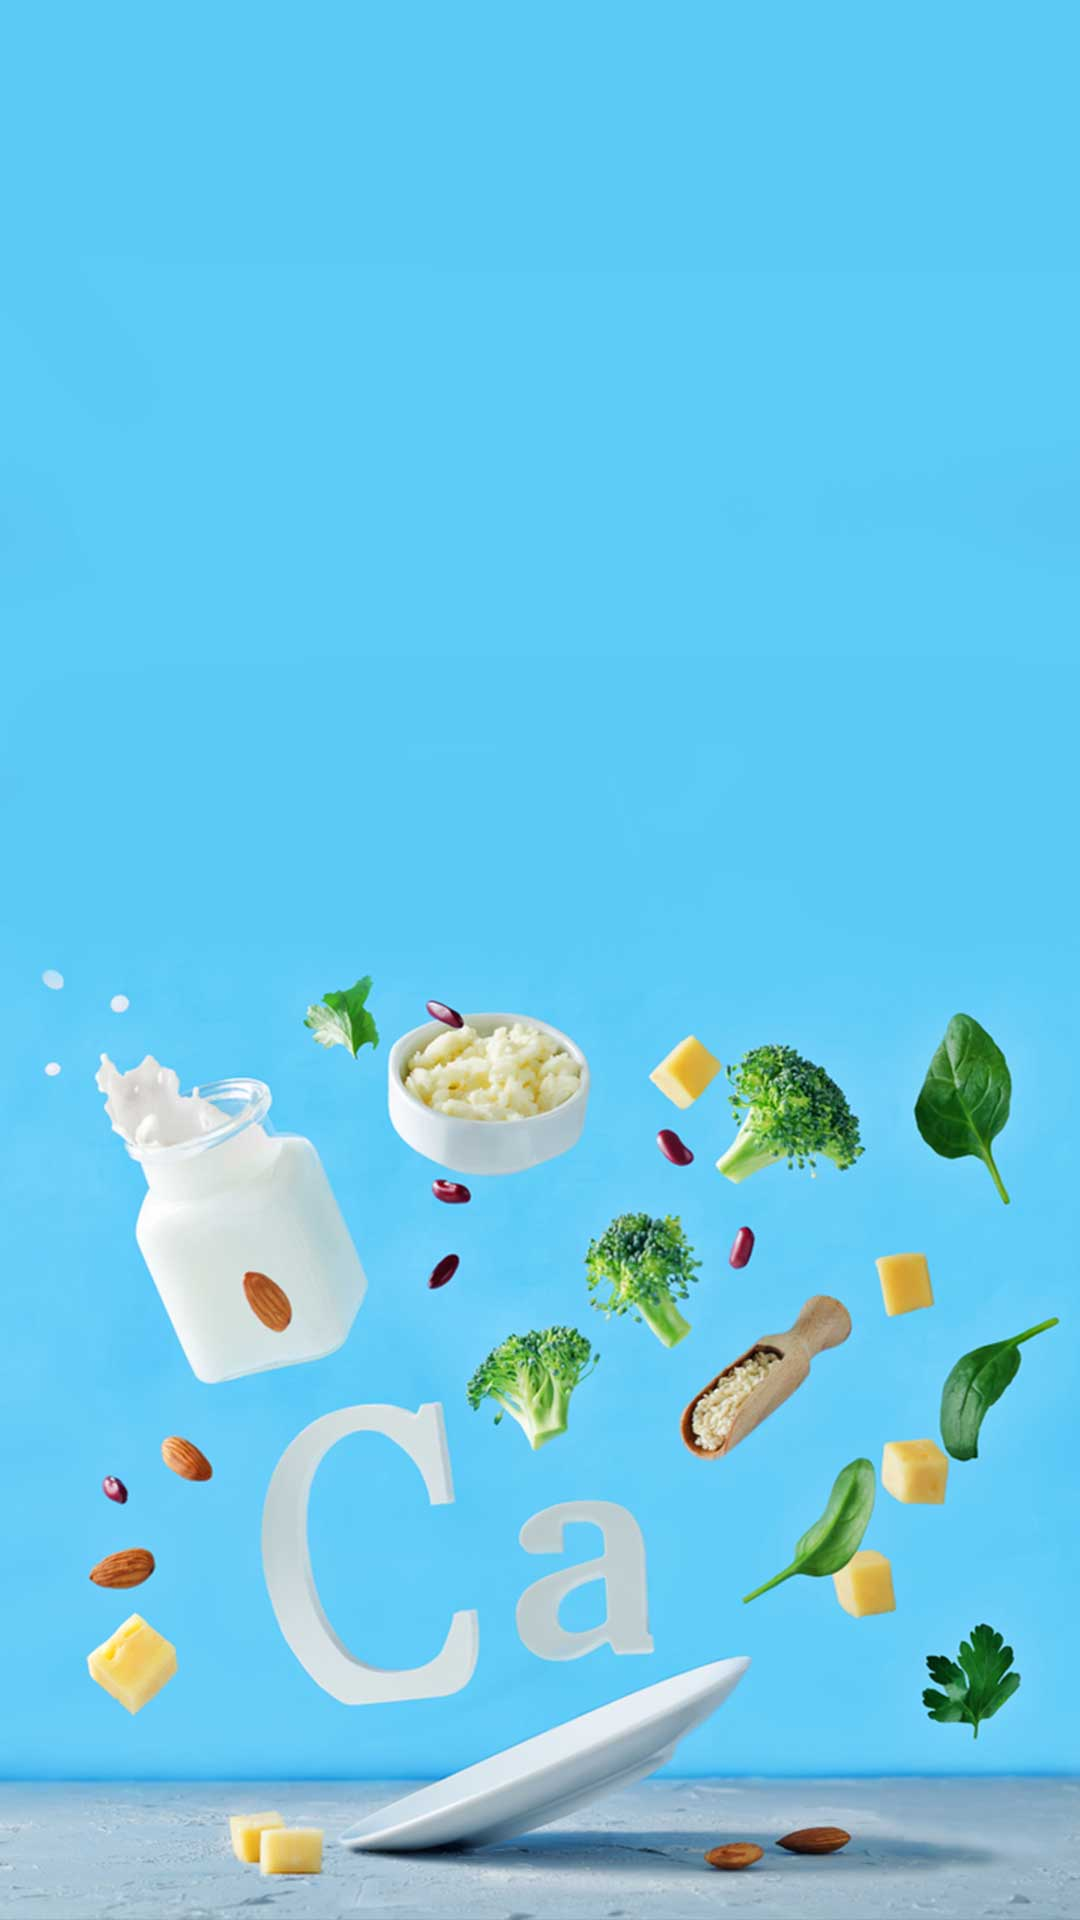 5 non-dairy RICH CALCIUM sources